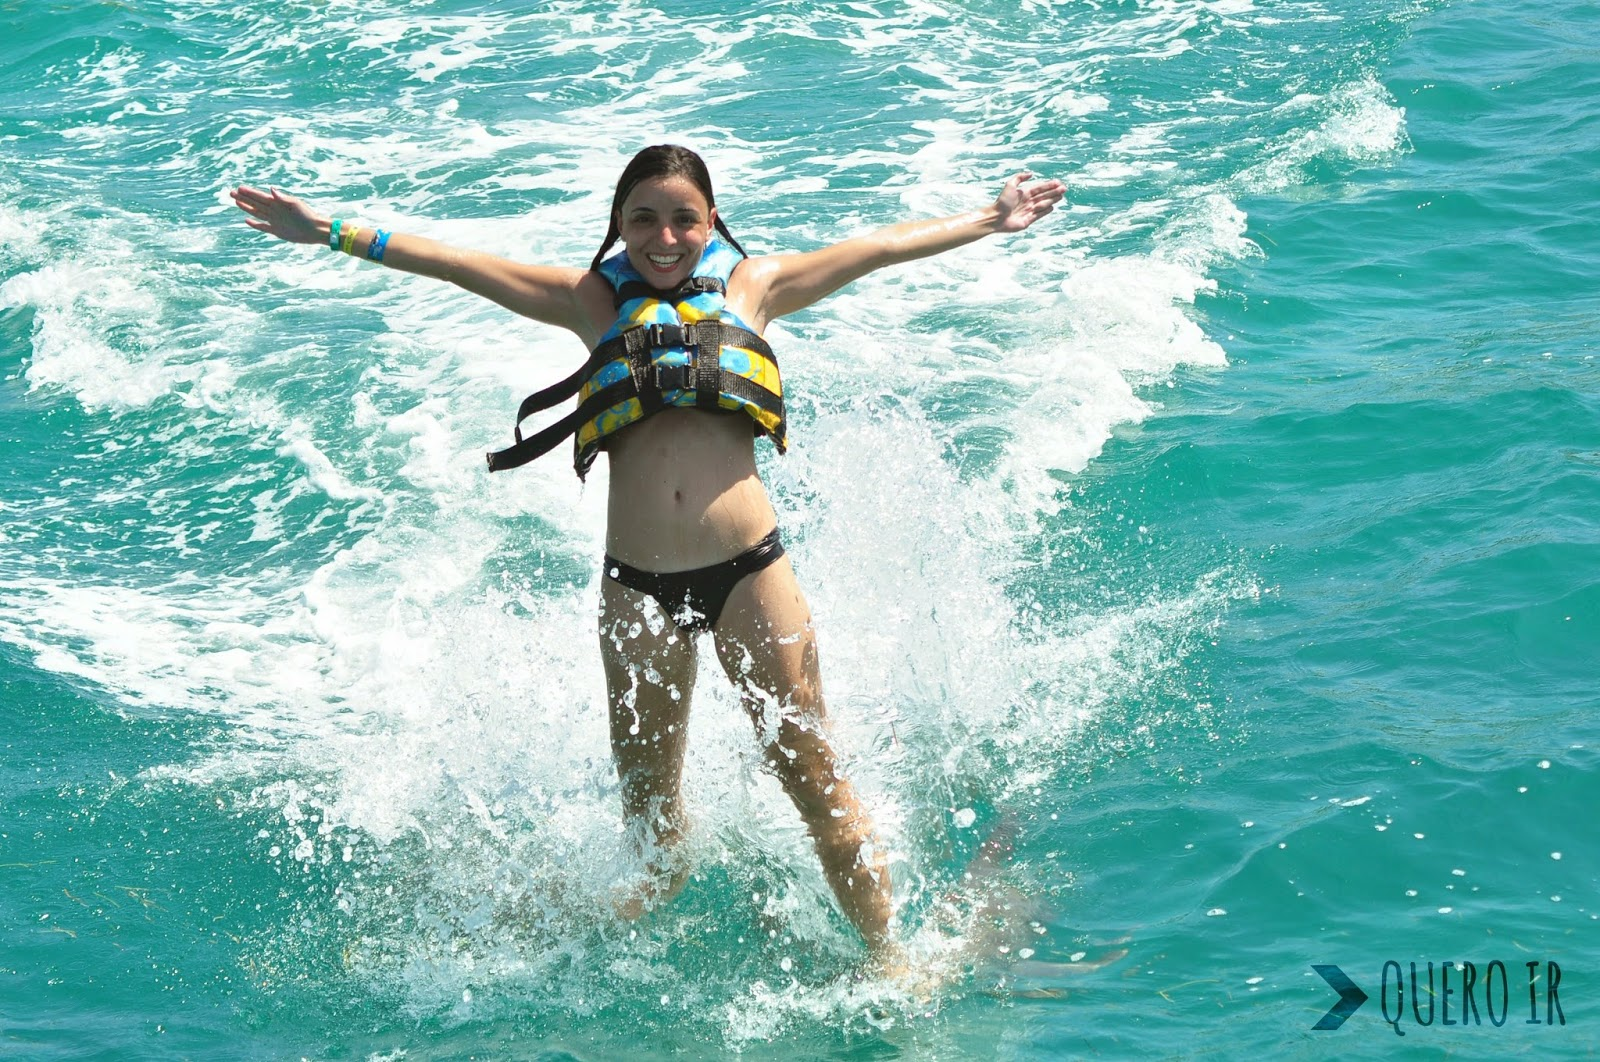 cancun golfinhos